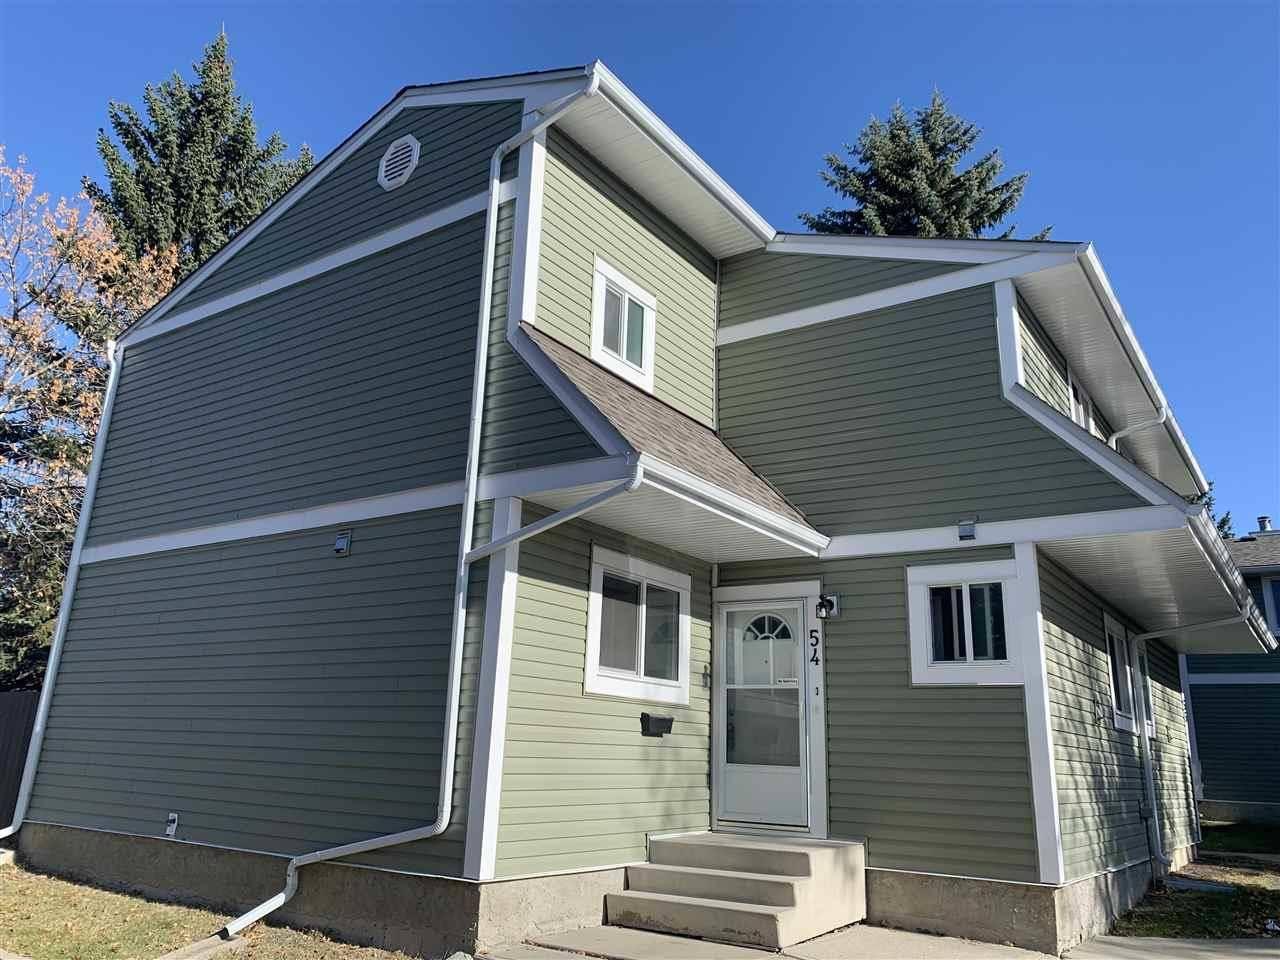 Townhouse for sale at 1820 56 St Nw Unit 54 Edmonton Alberta - MLS: E4176150